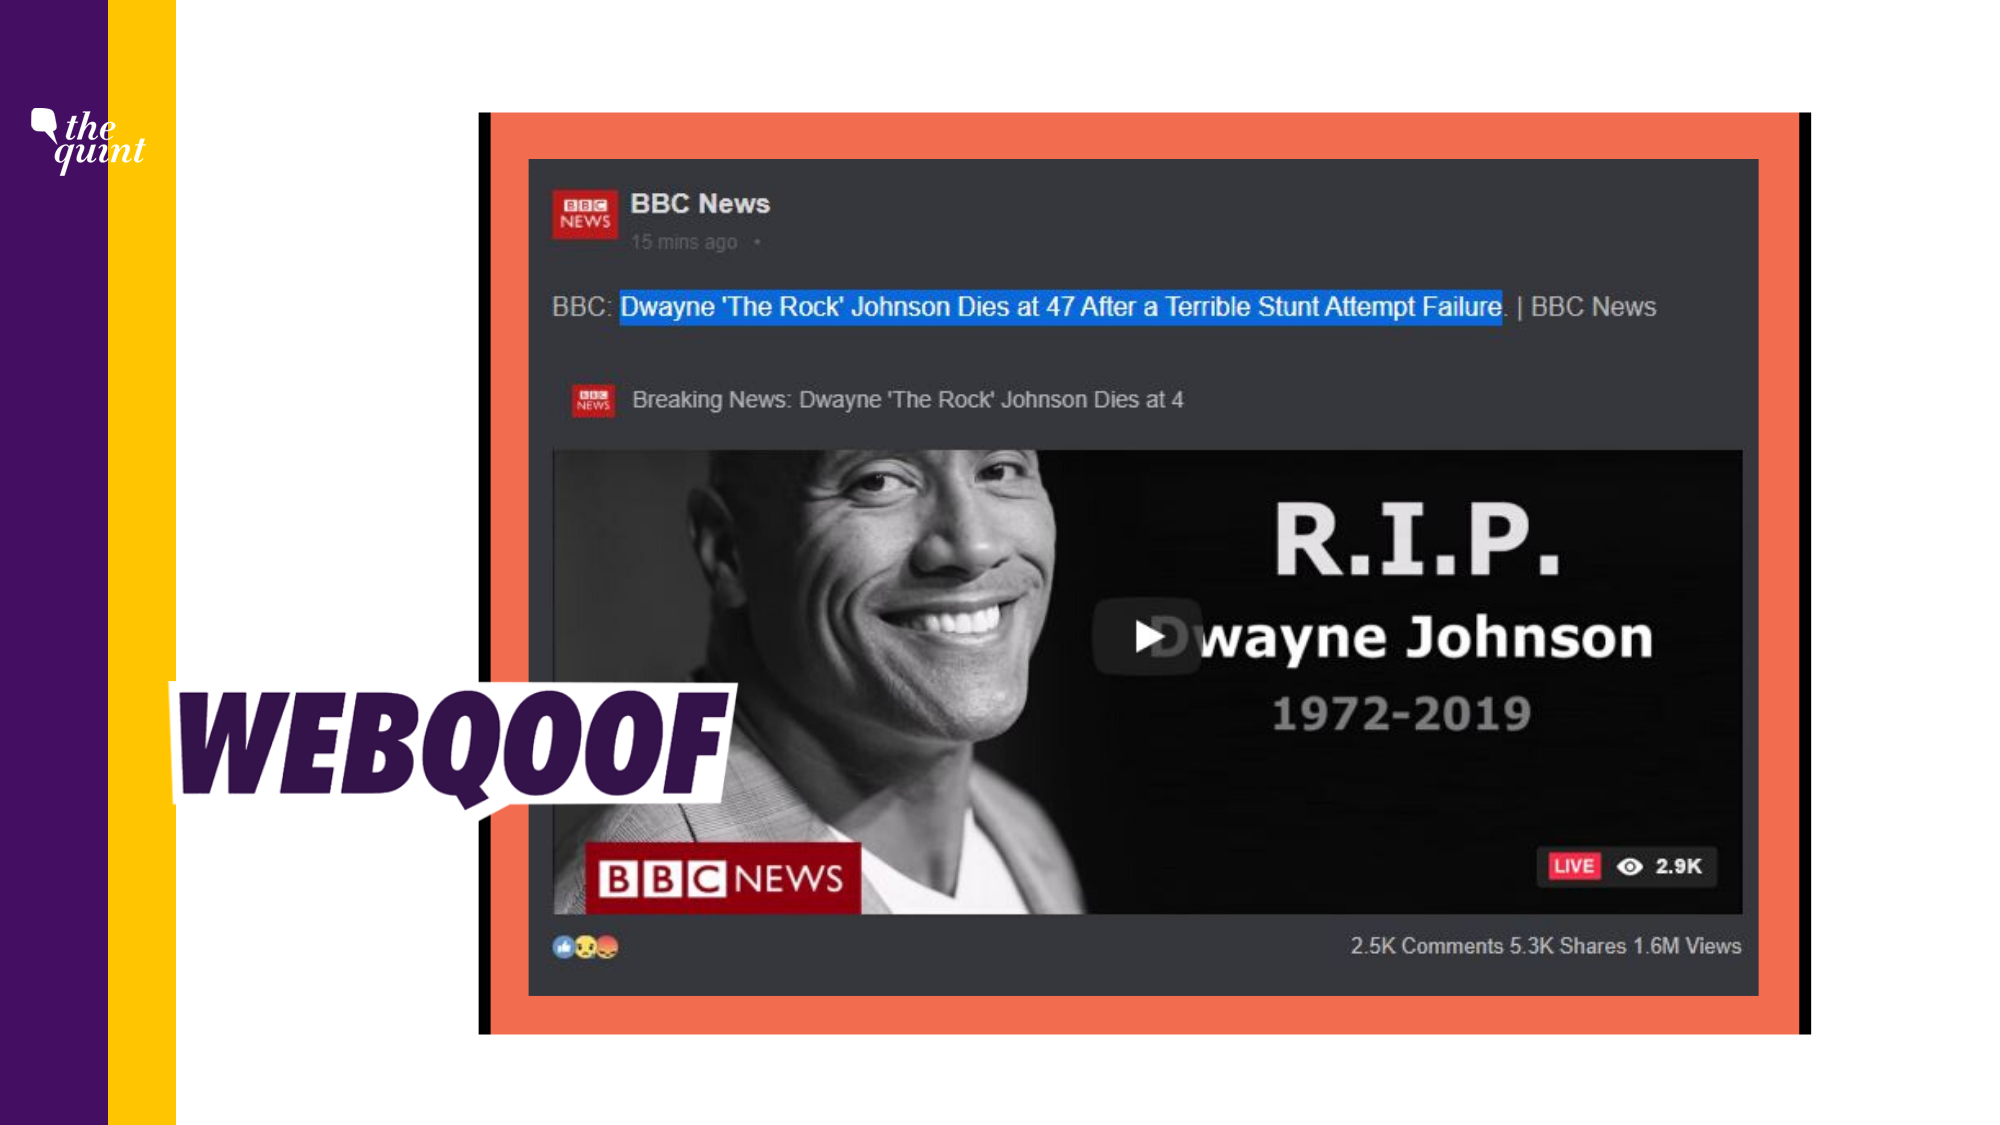 Hoax Website Falsely Claims Dwayne Johnson is Dead